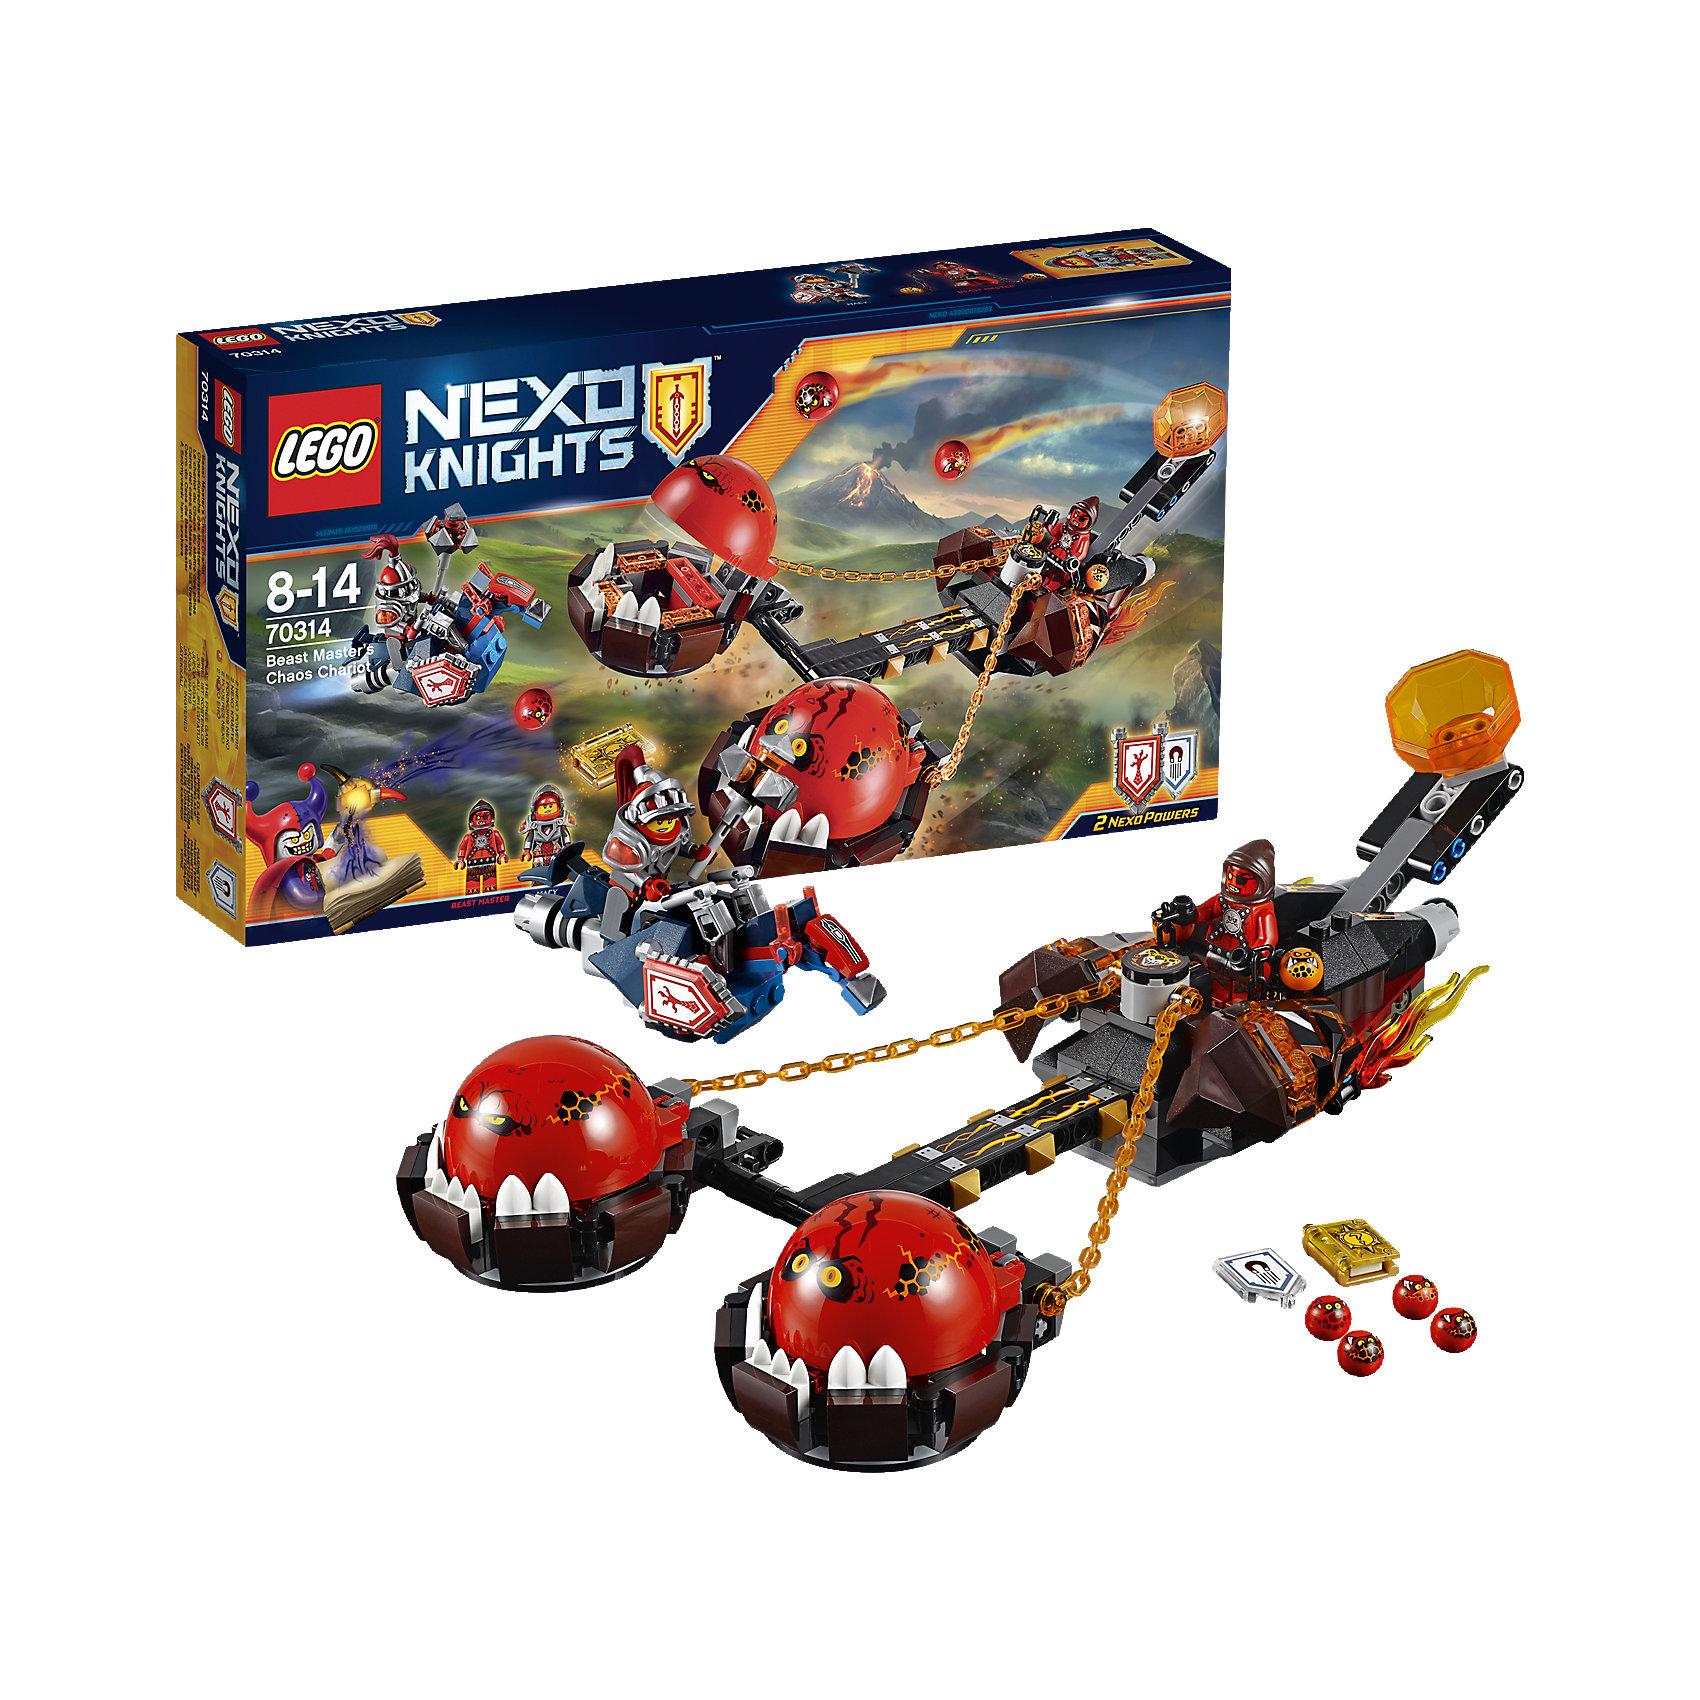 LEGO LEGO NEXO KNIGHTS 70314: Безумная колесница Укротителя брелоки lego брелок фонарик для ключей lego nexo knights рыцари нексо clay